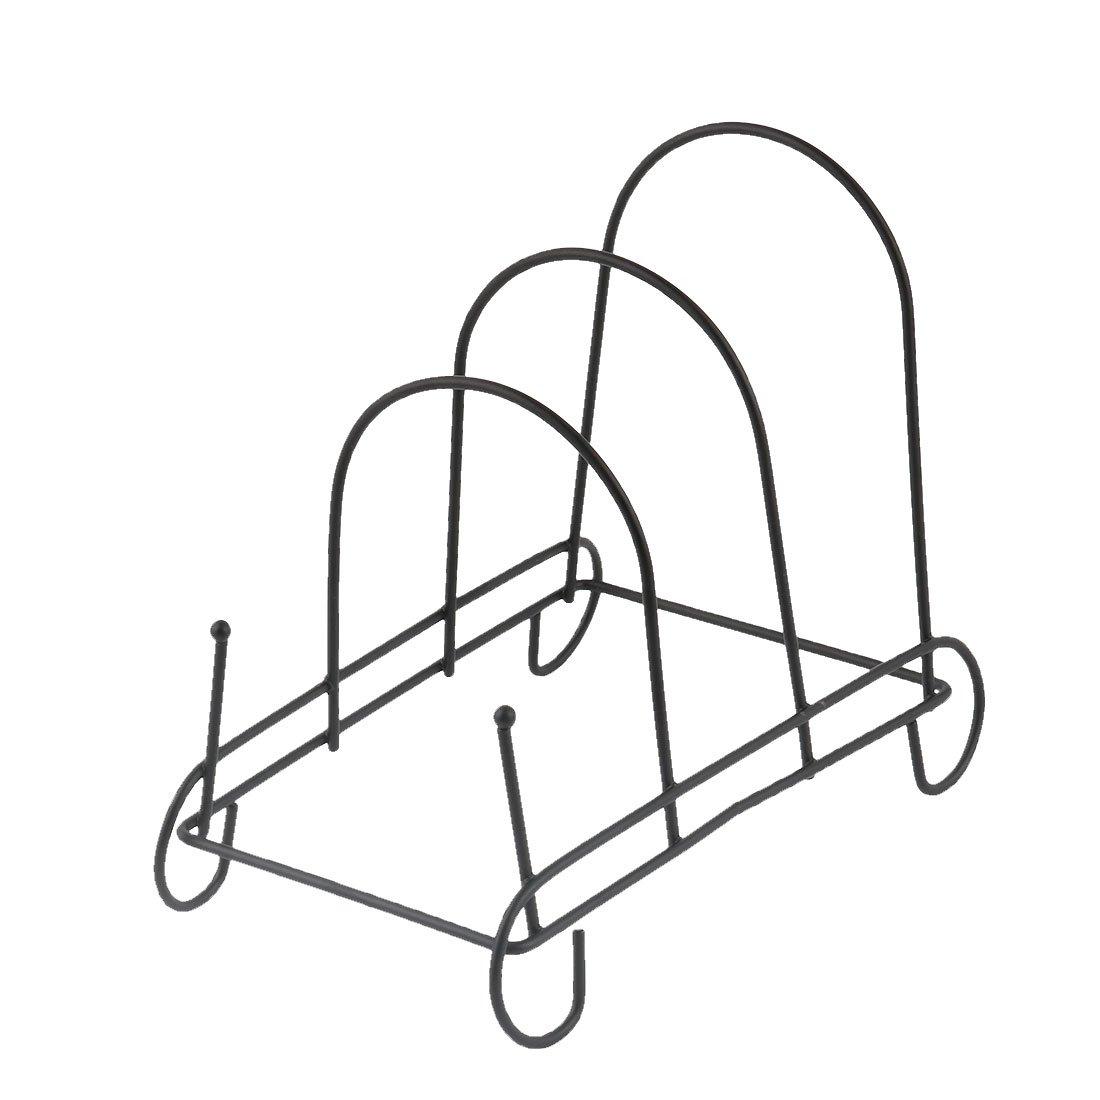 uxcell Metal Bowl Dish Plate Rack Drying Organizer Drainer Storage Holder Sink Cabinet Kitchen 18.2 x 9.7 x 15.5cm